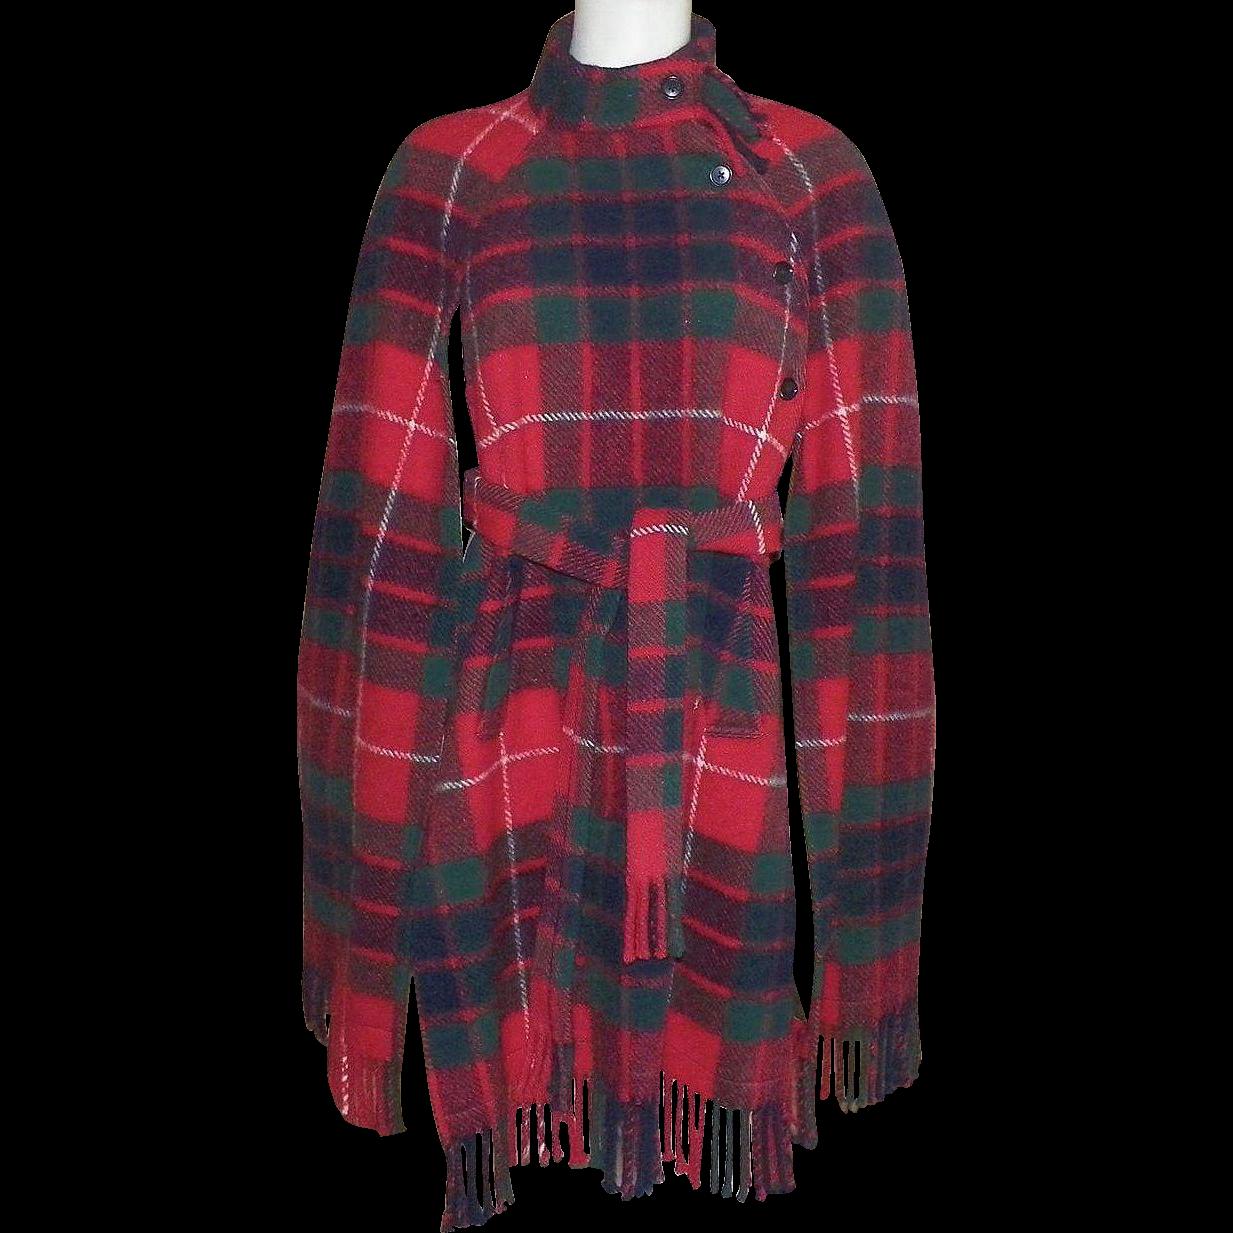 Vintage Scottish Tartan Wool Plaid Cape With Fringe